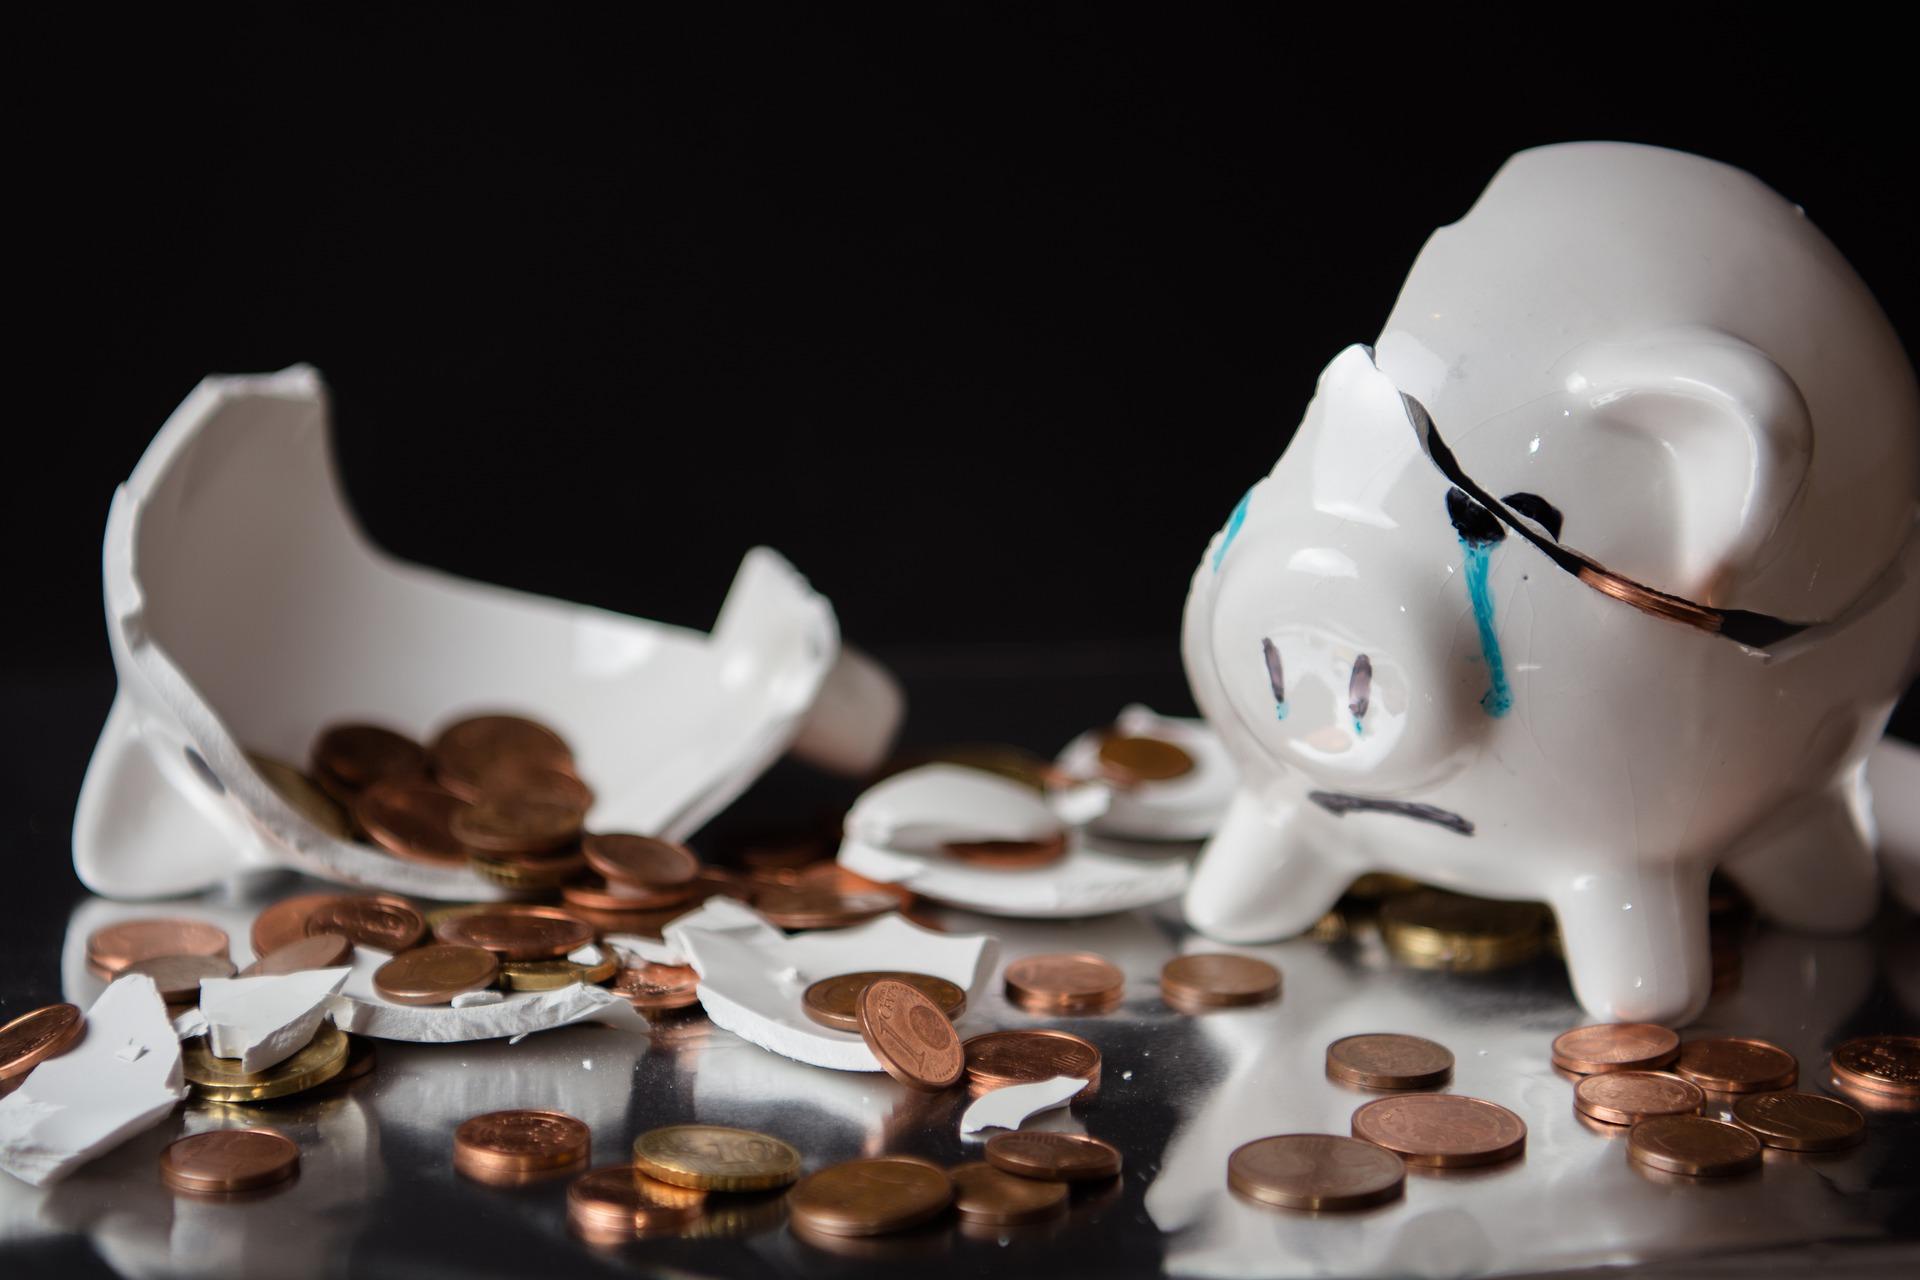 Broken piggy bank with coins everywhere